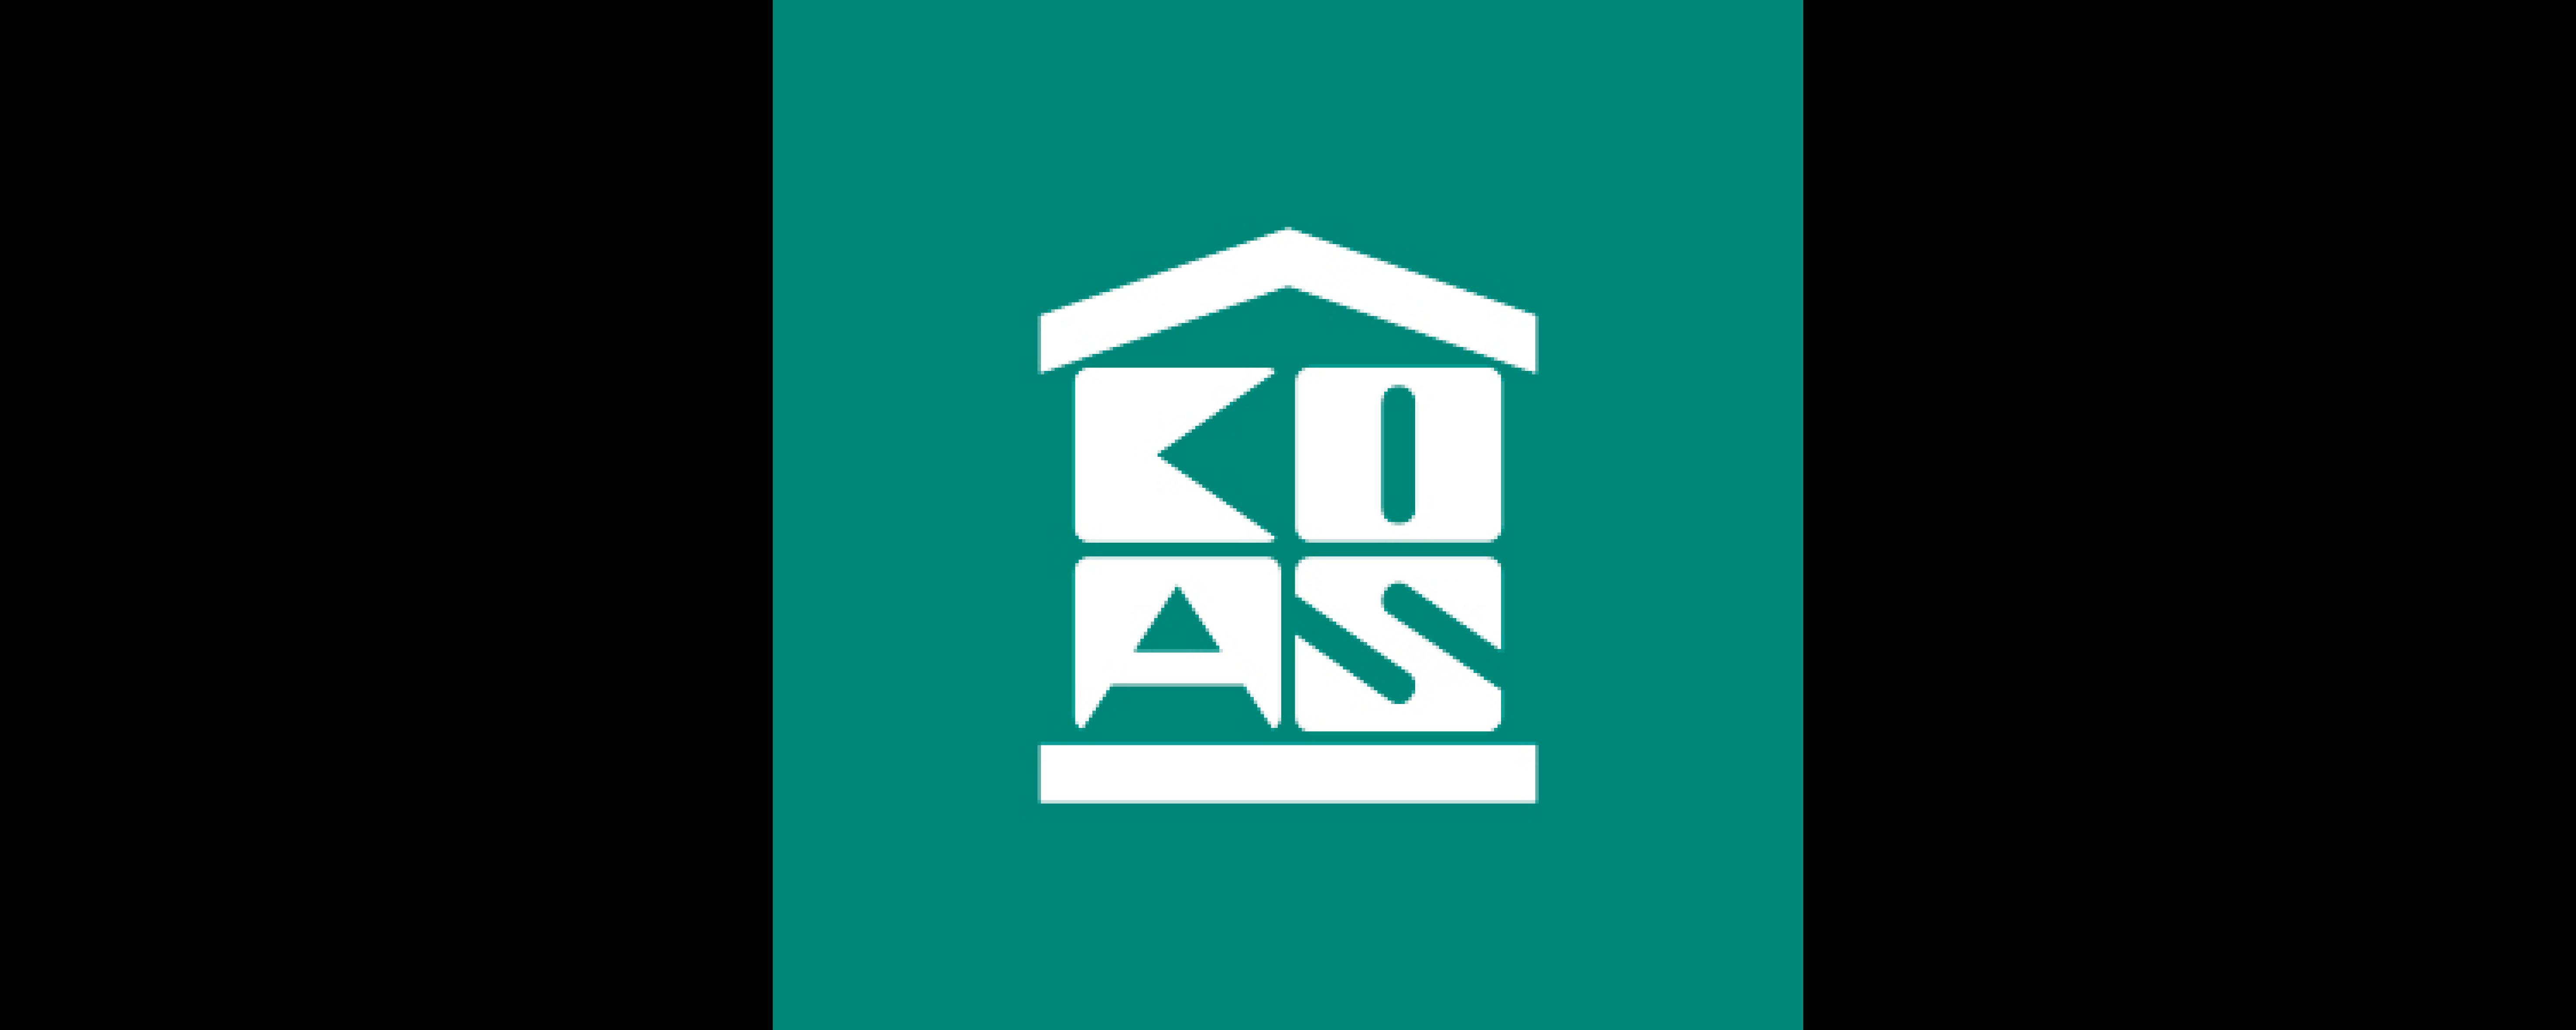 koas-getjenny-logo